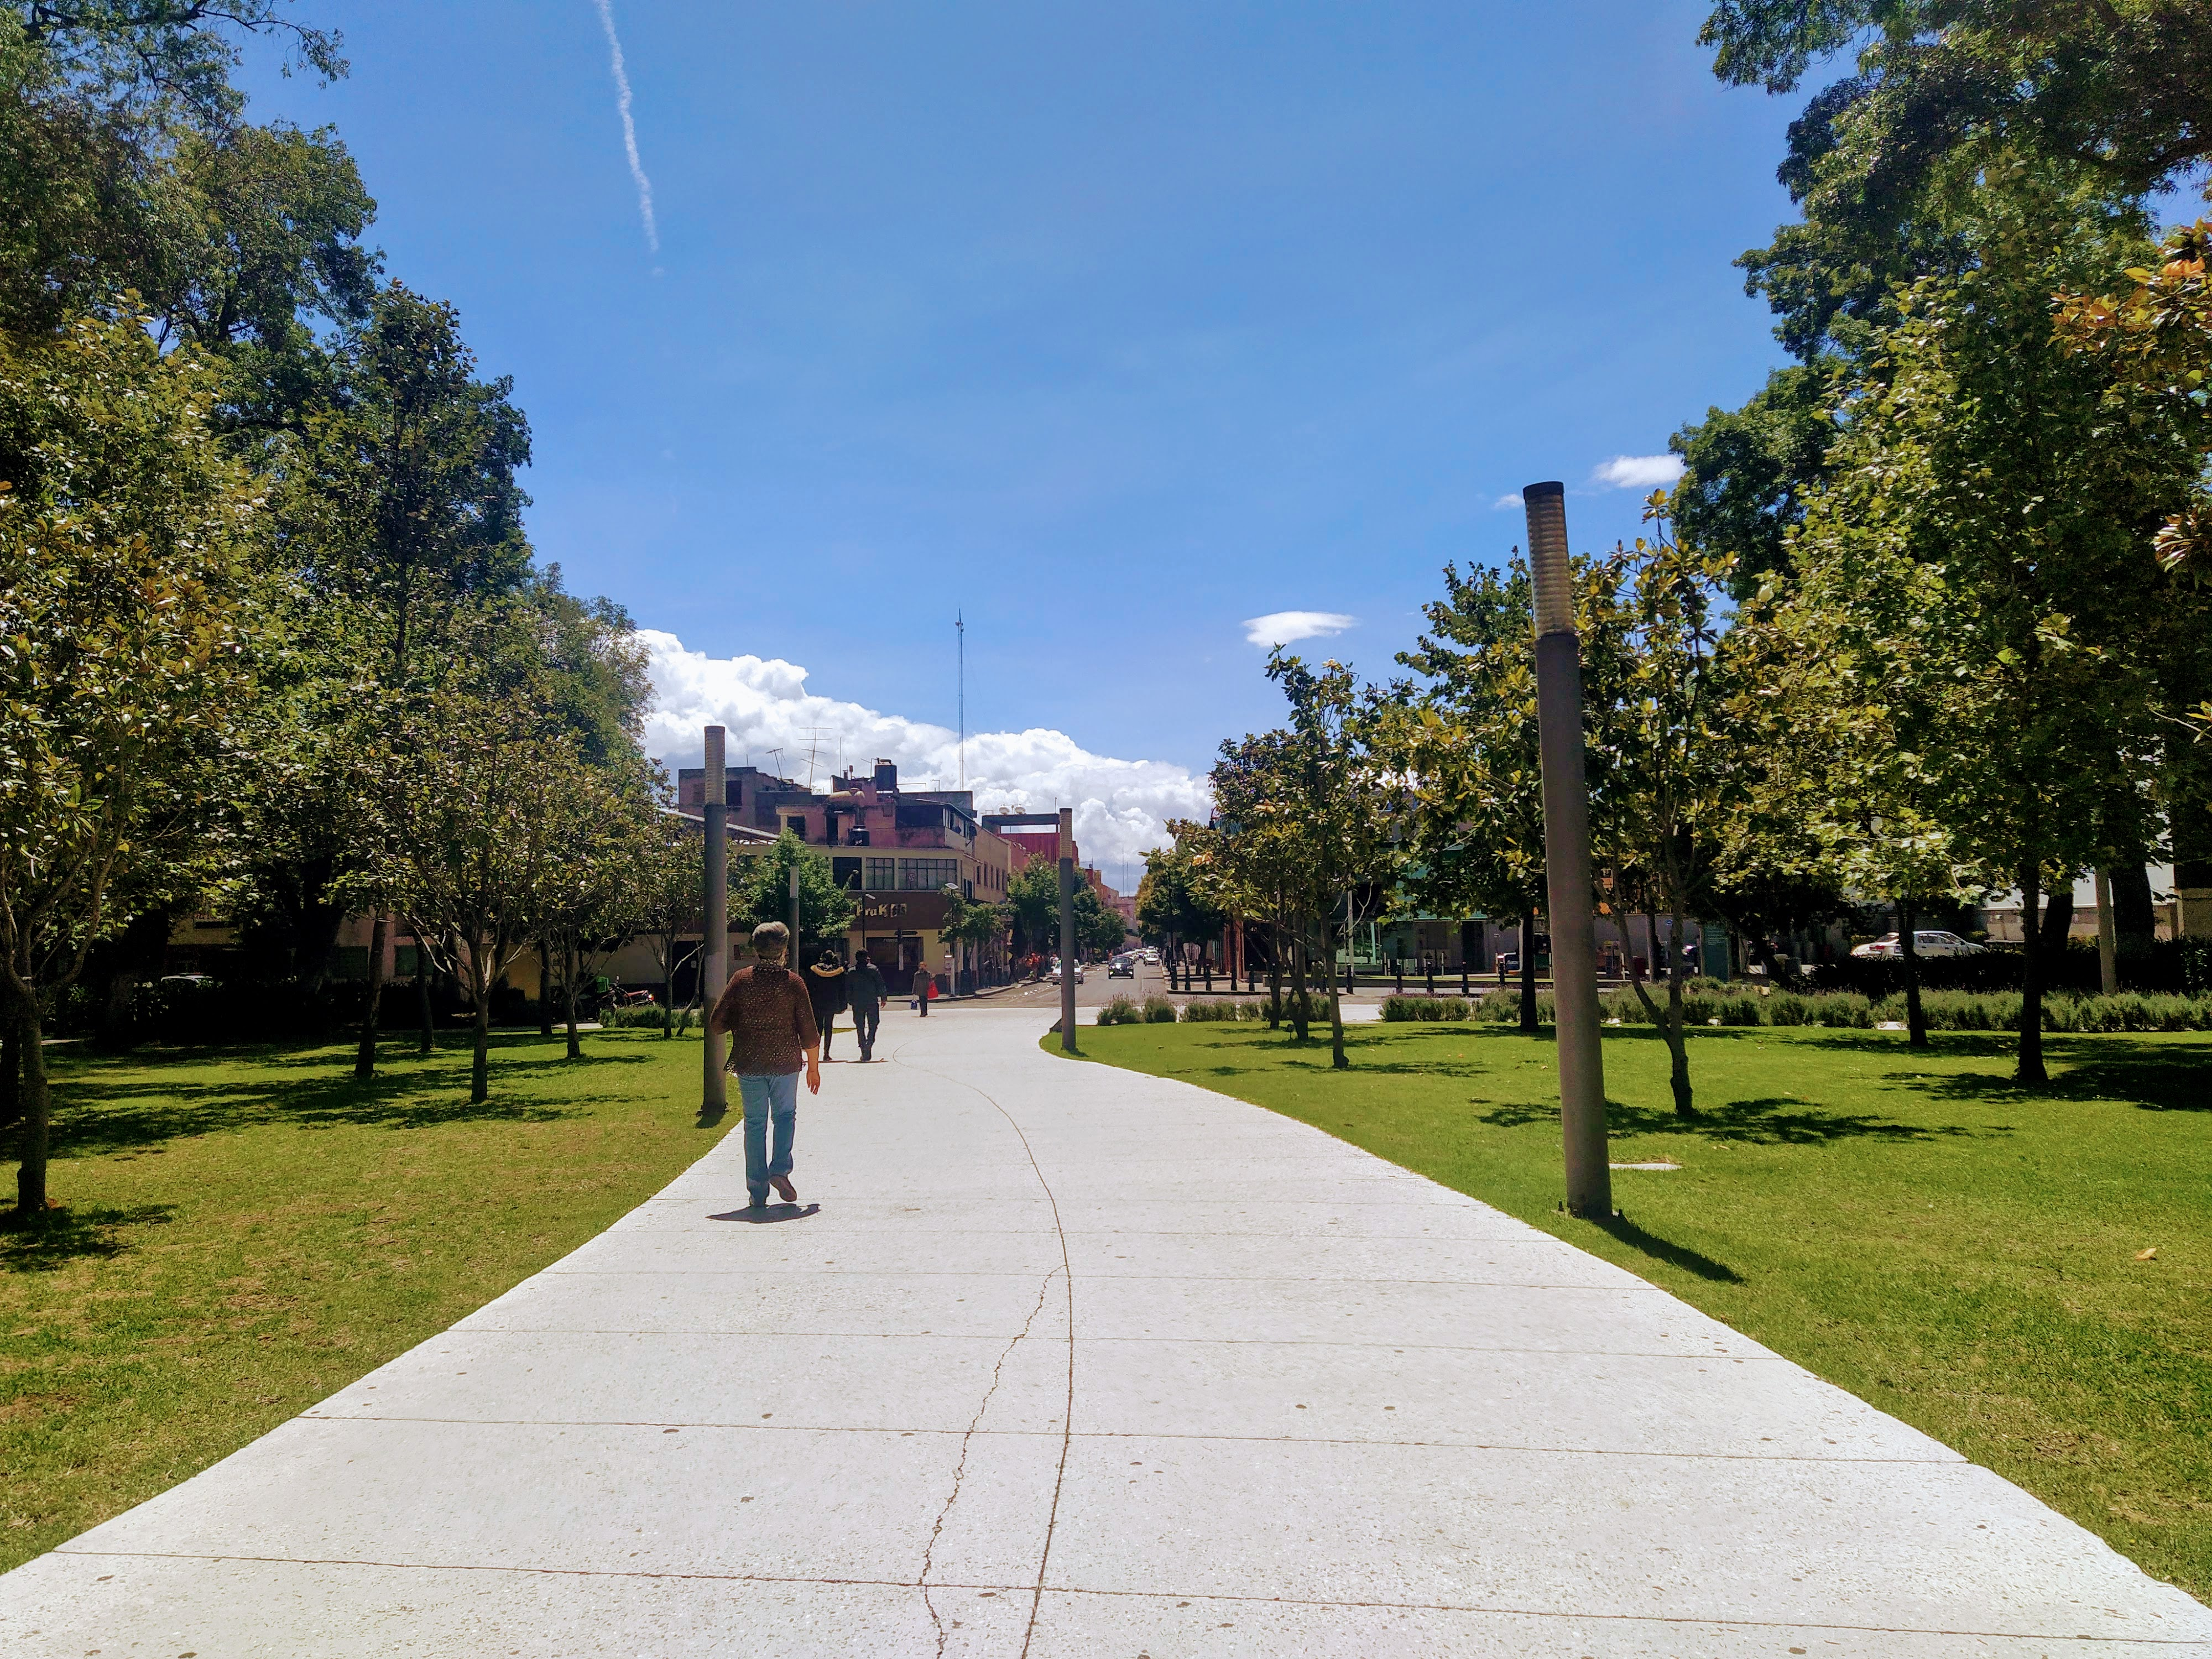 toluquenos-siguen-yendo-a-parques-y-plazas-publicas-pese-a-estar-cerrados5